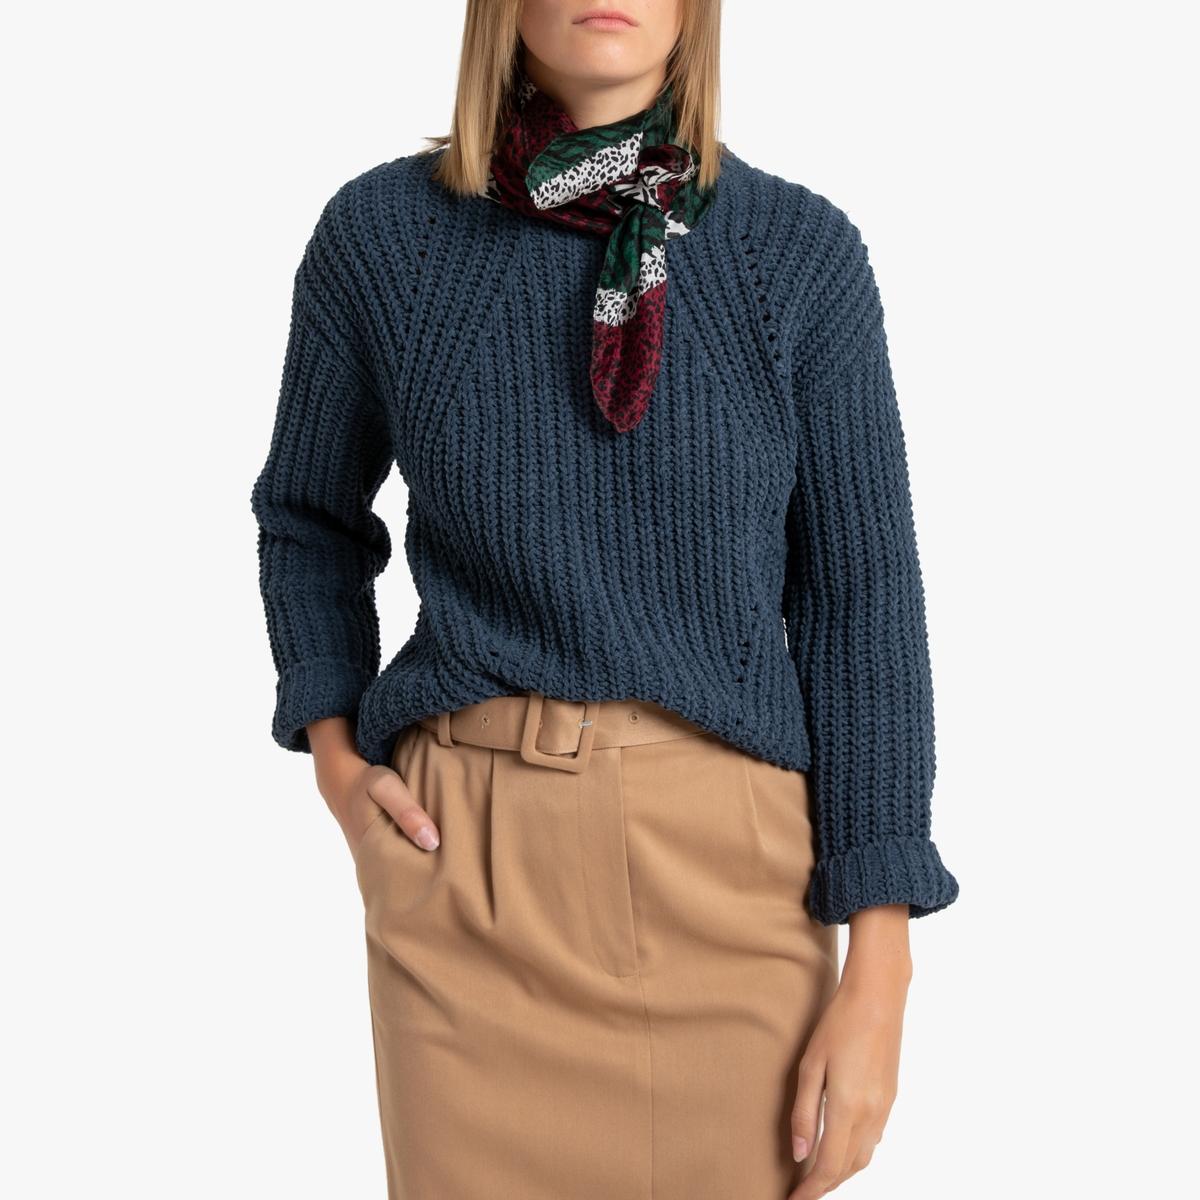 Пуловер La Redoute С круглым вырезом из трикотажа с ворсом S синий свитшот la redoute с круглым вырезом и вышивкой s черный